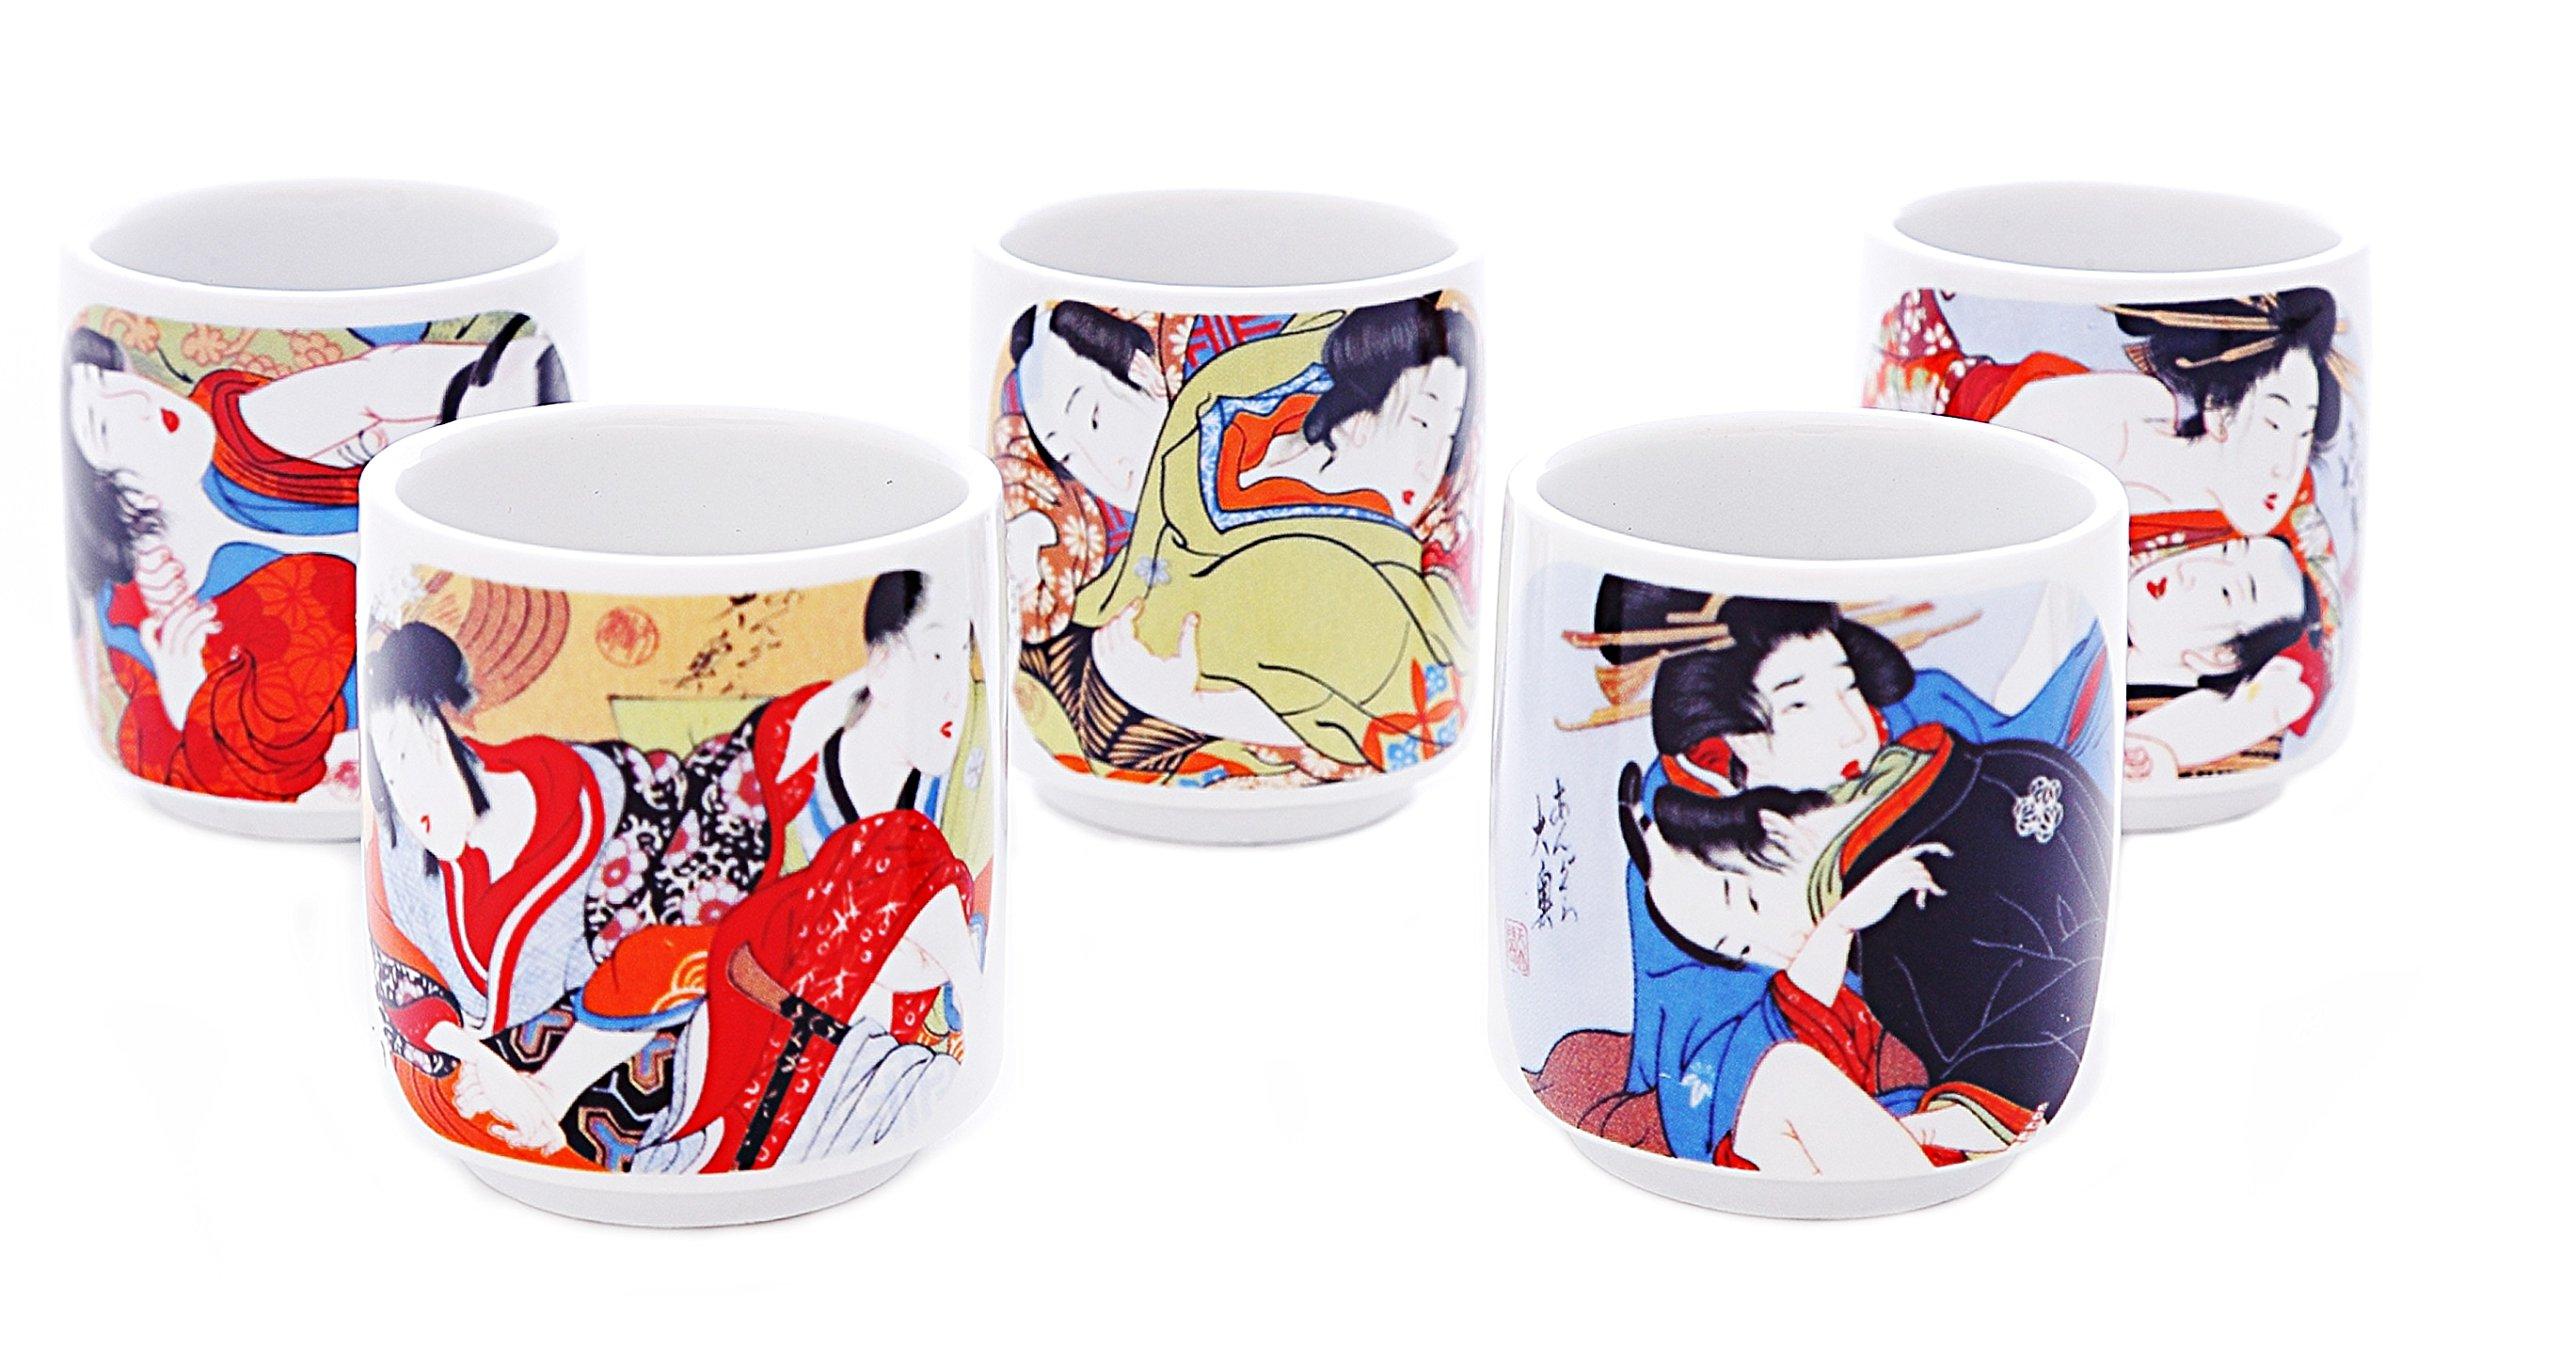 5 PCS CERAMIC JAPANESE SAKE CUPS GUINOMI (EROTIC ART)